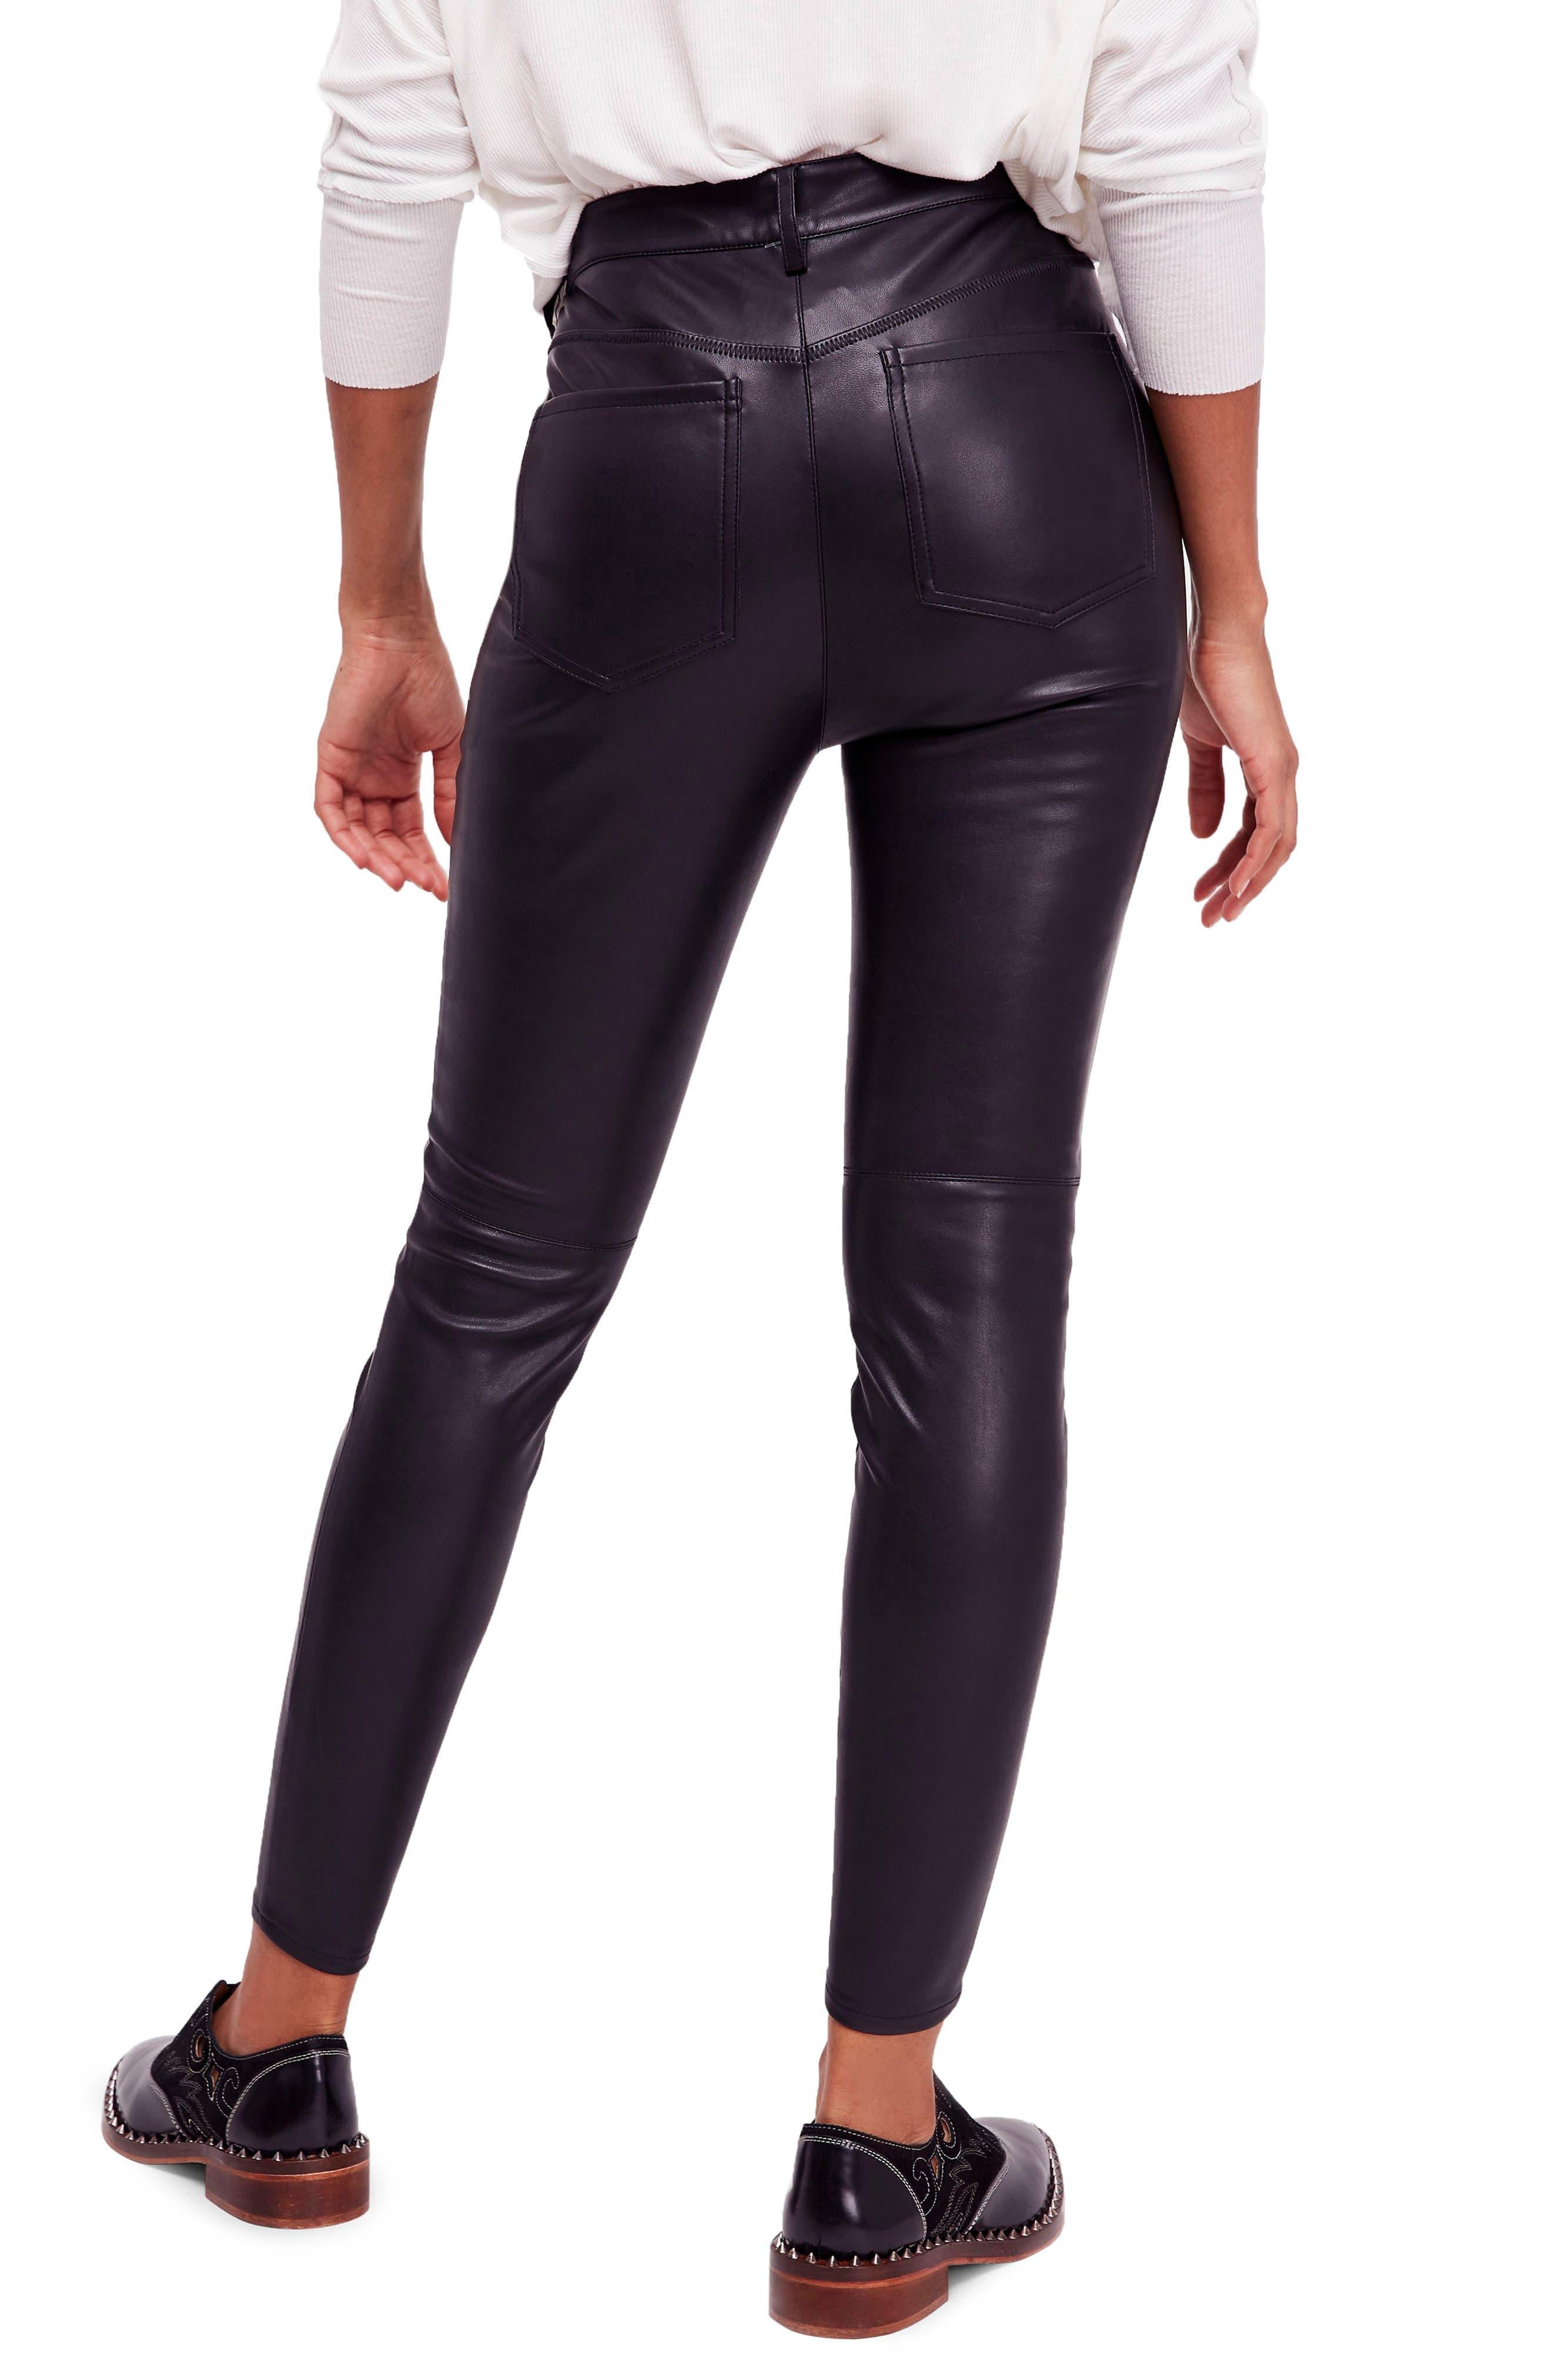 Long & Lean High Waist Leggings,                             Alternate thumbnail 2, color,                             BLACK